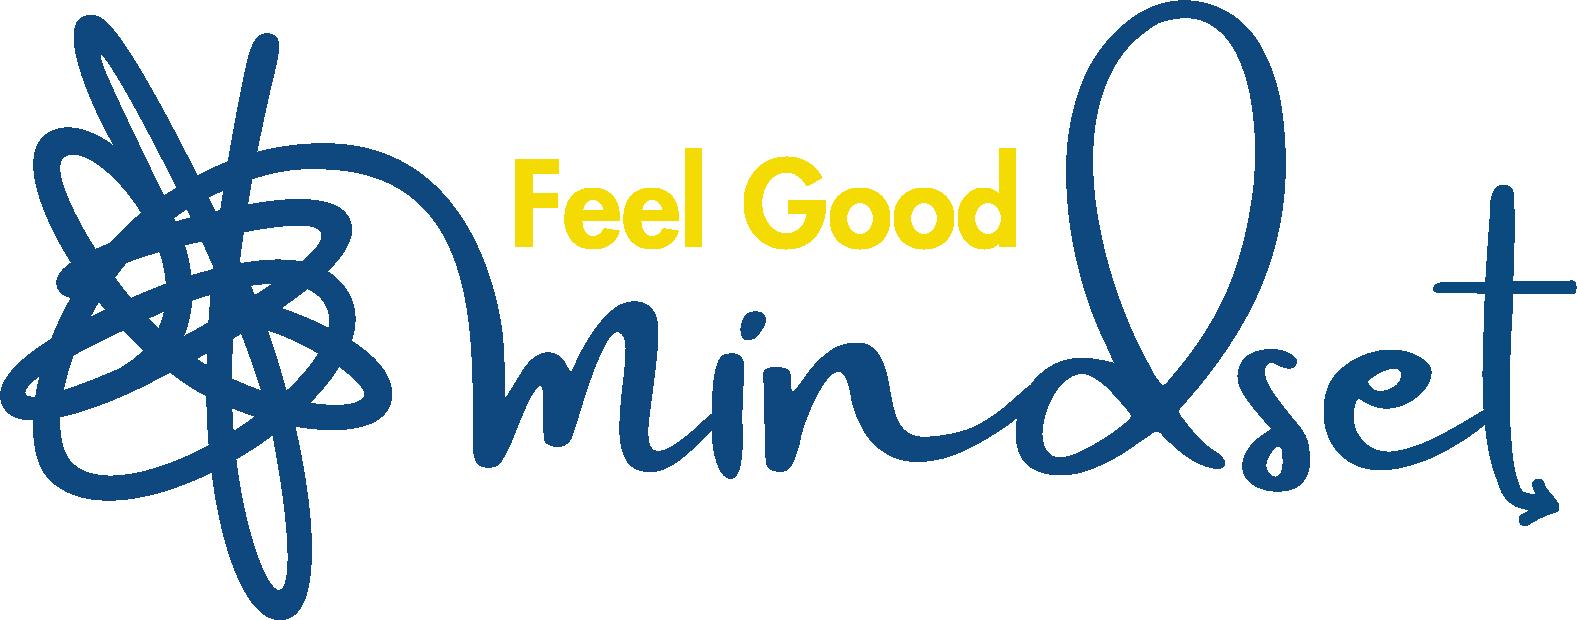 Feel Good Mindset